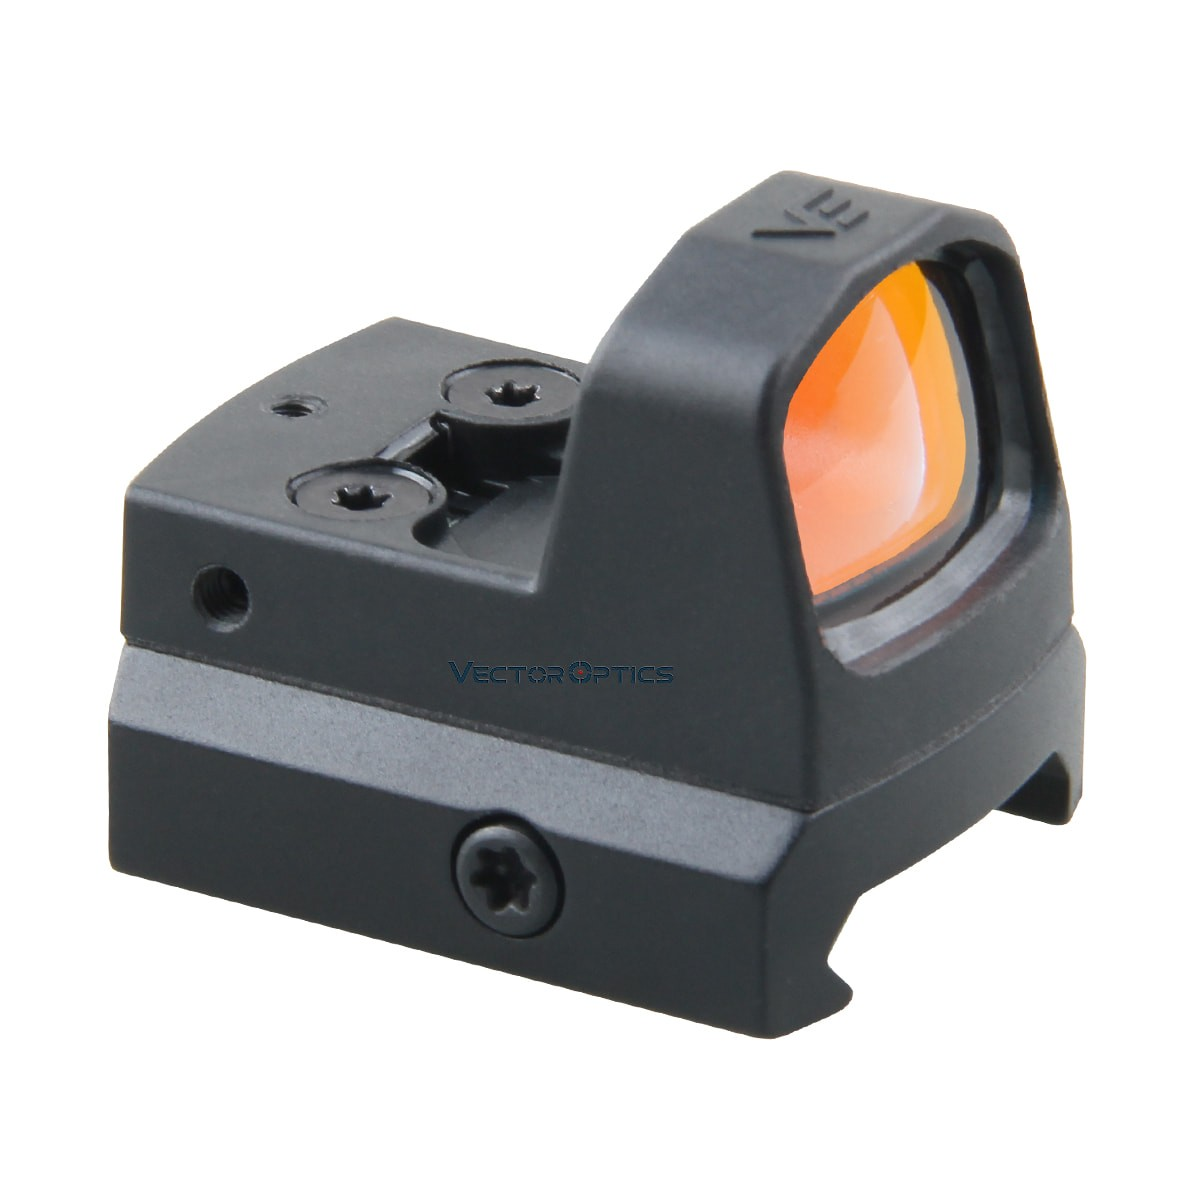 Vector Optics FRENZY-S 1x16x22 AUT SCRD-49